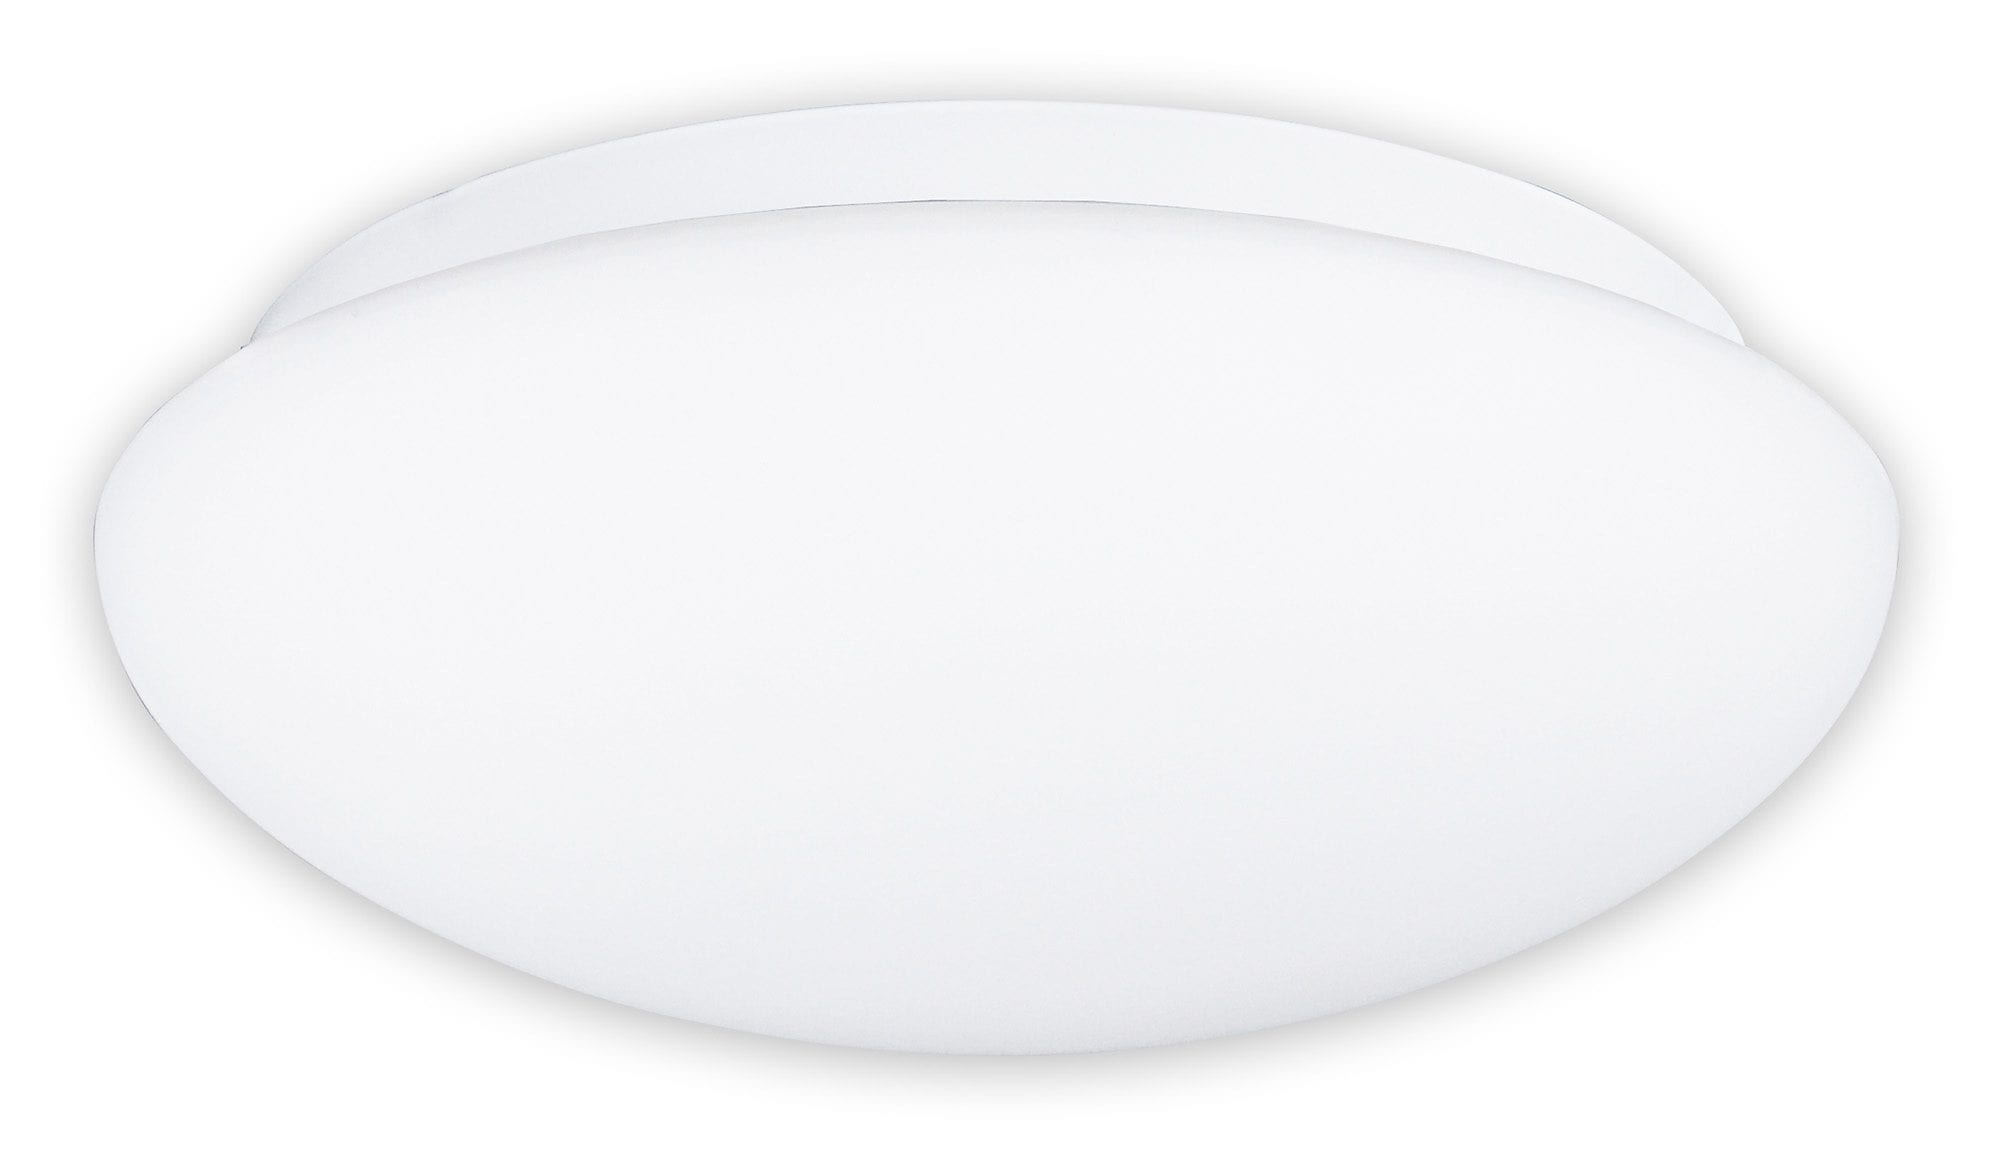 näve LED Deckenleuchte, LED-Board, Kaltweiß, mit Sensor